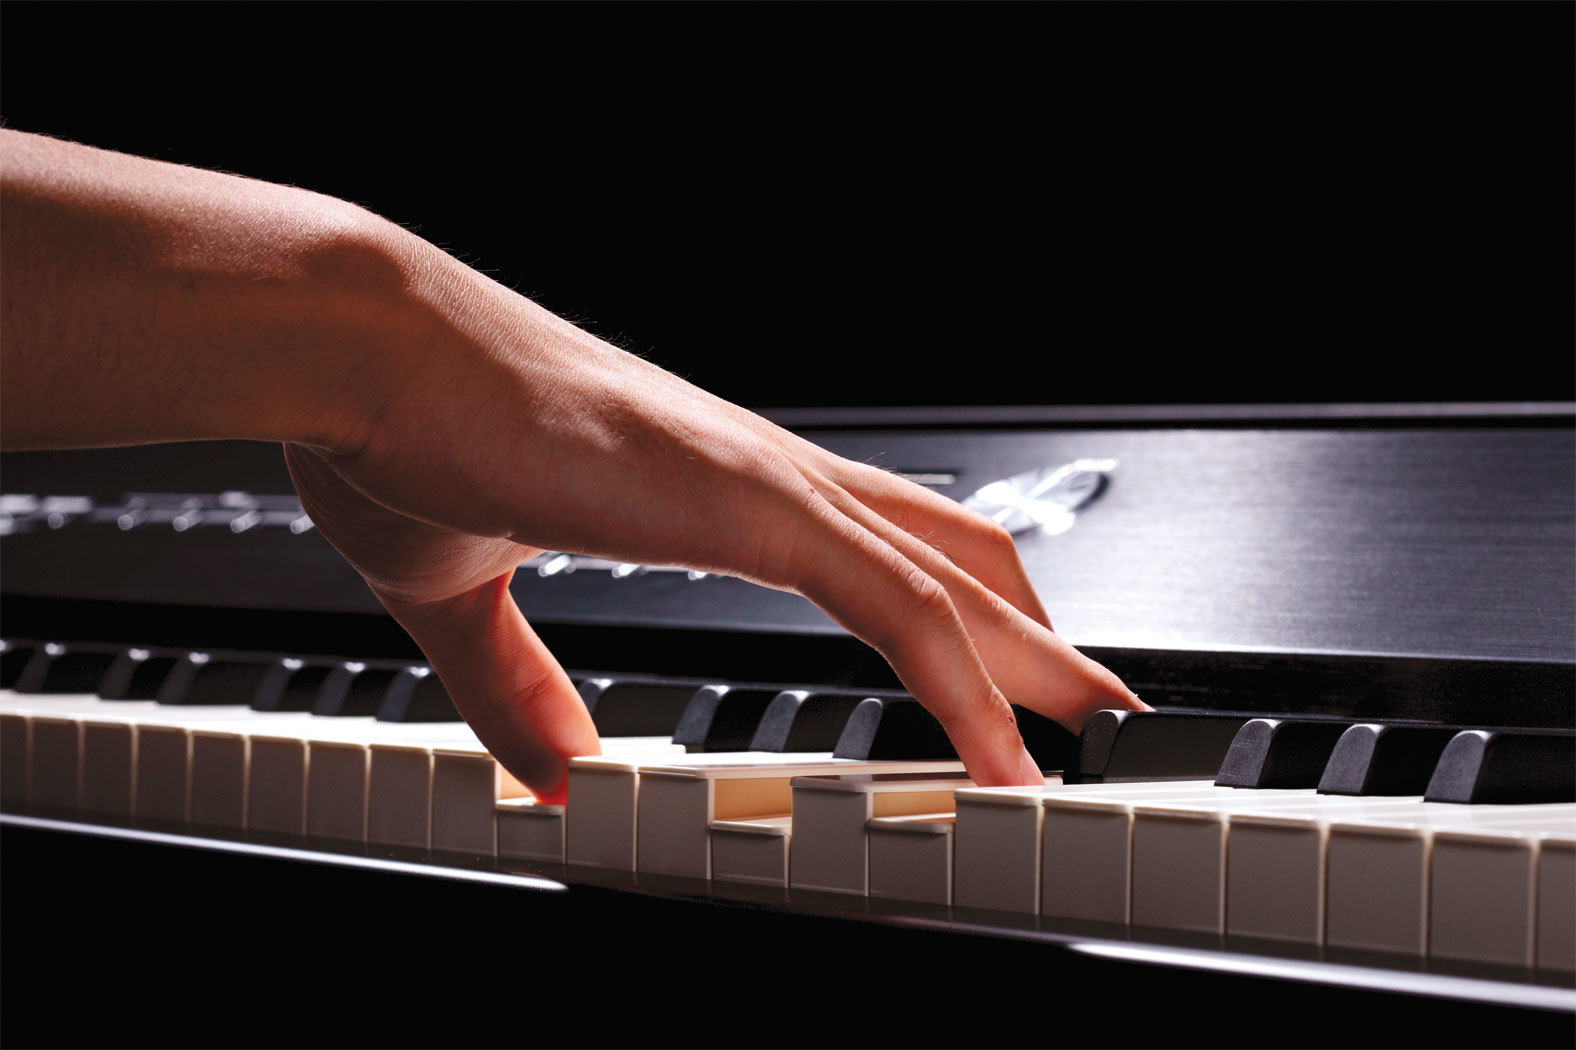 v_piano_keys_hand_gal.jpg